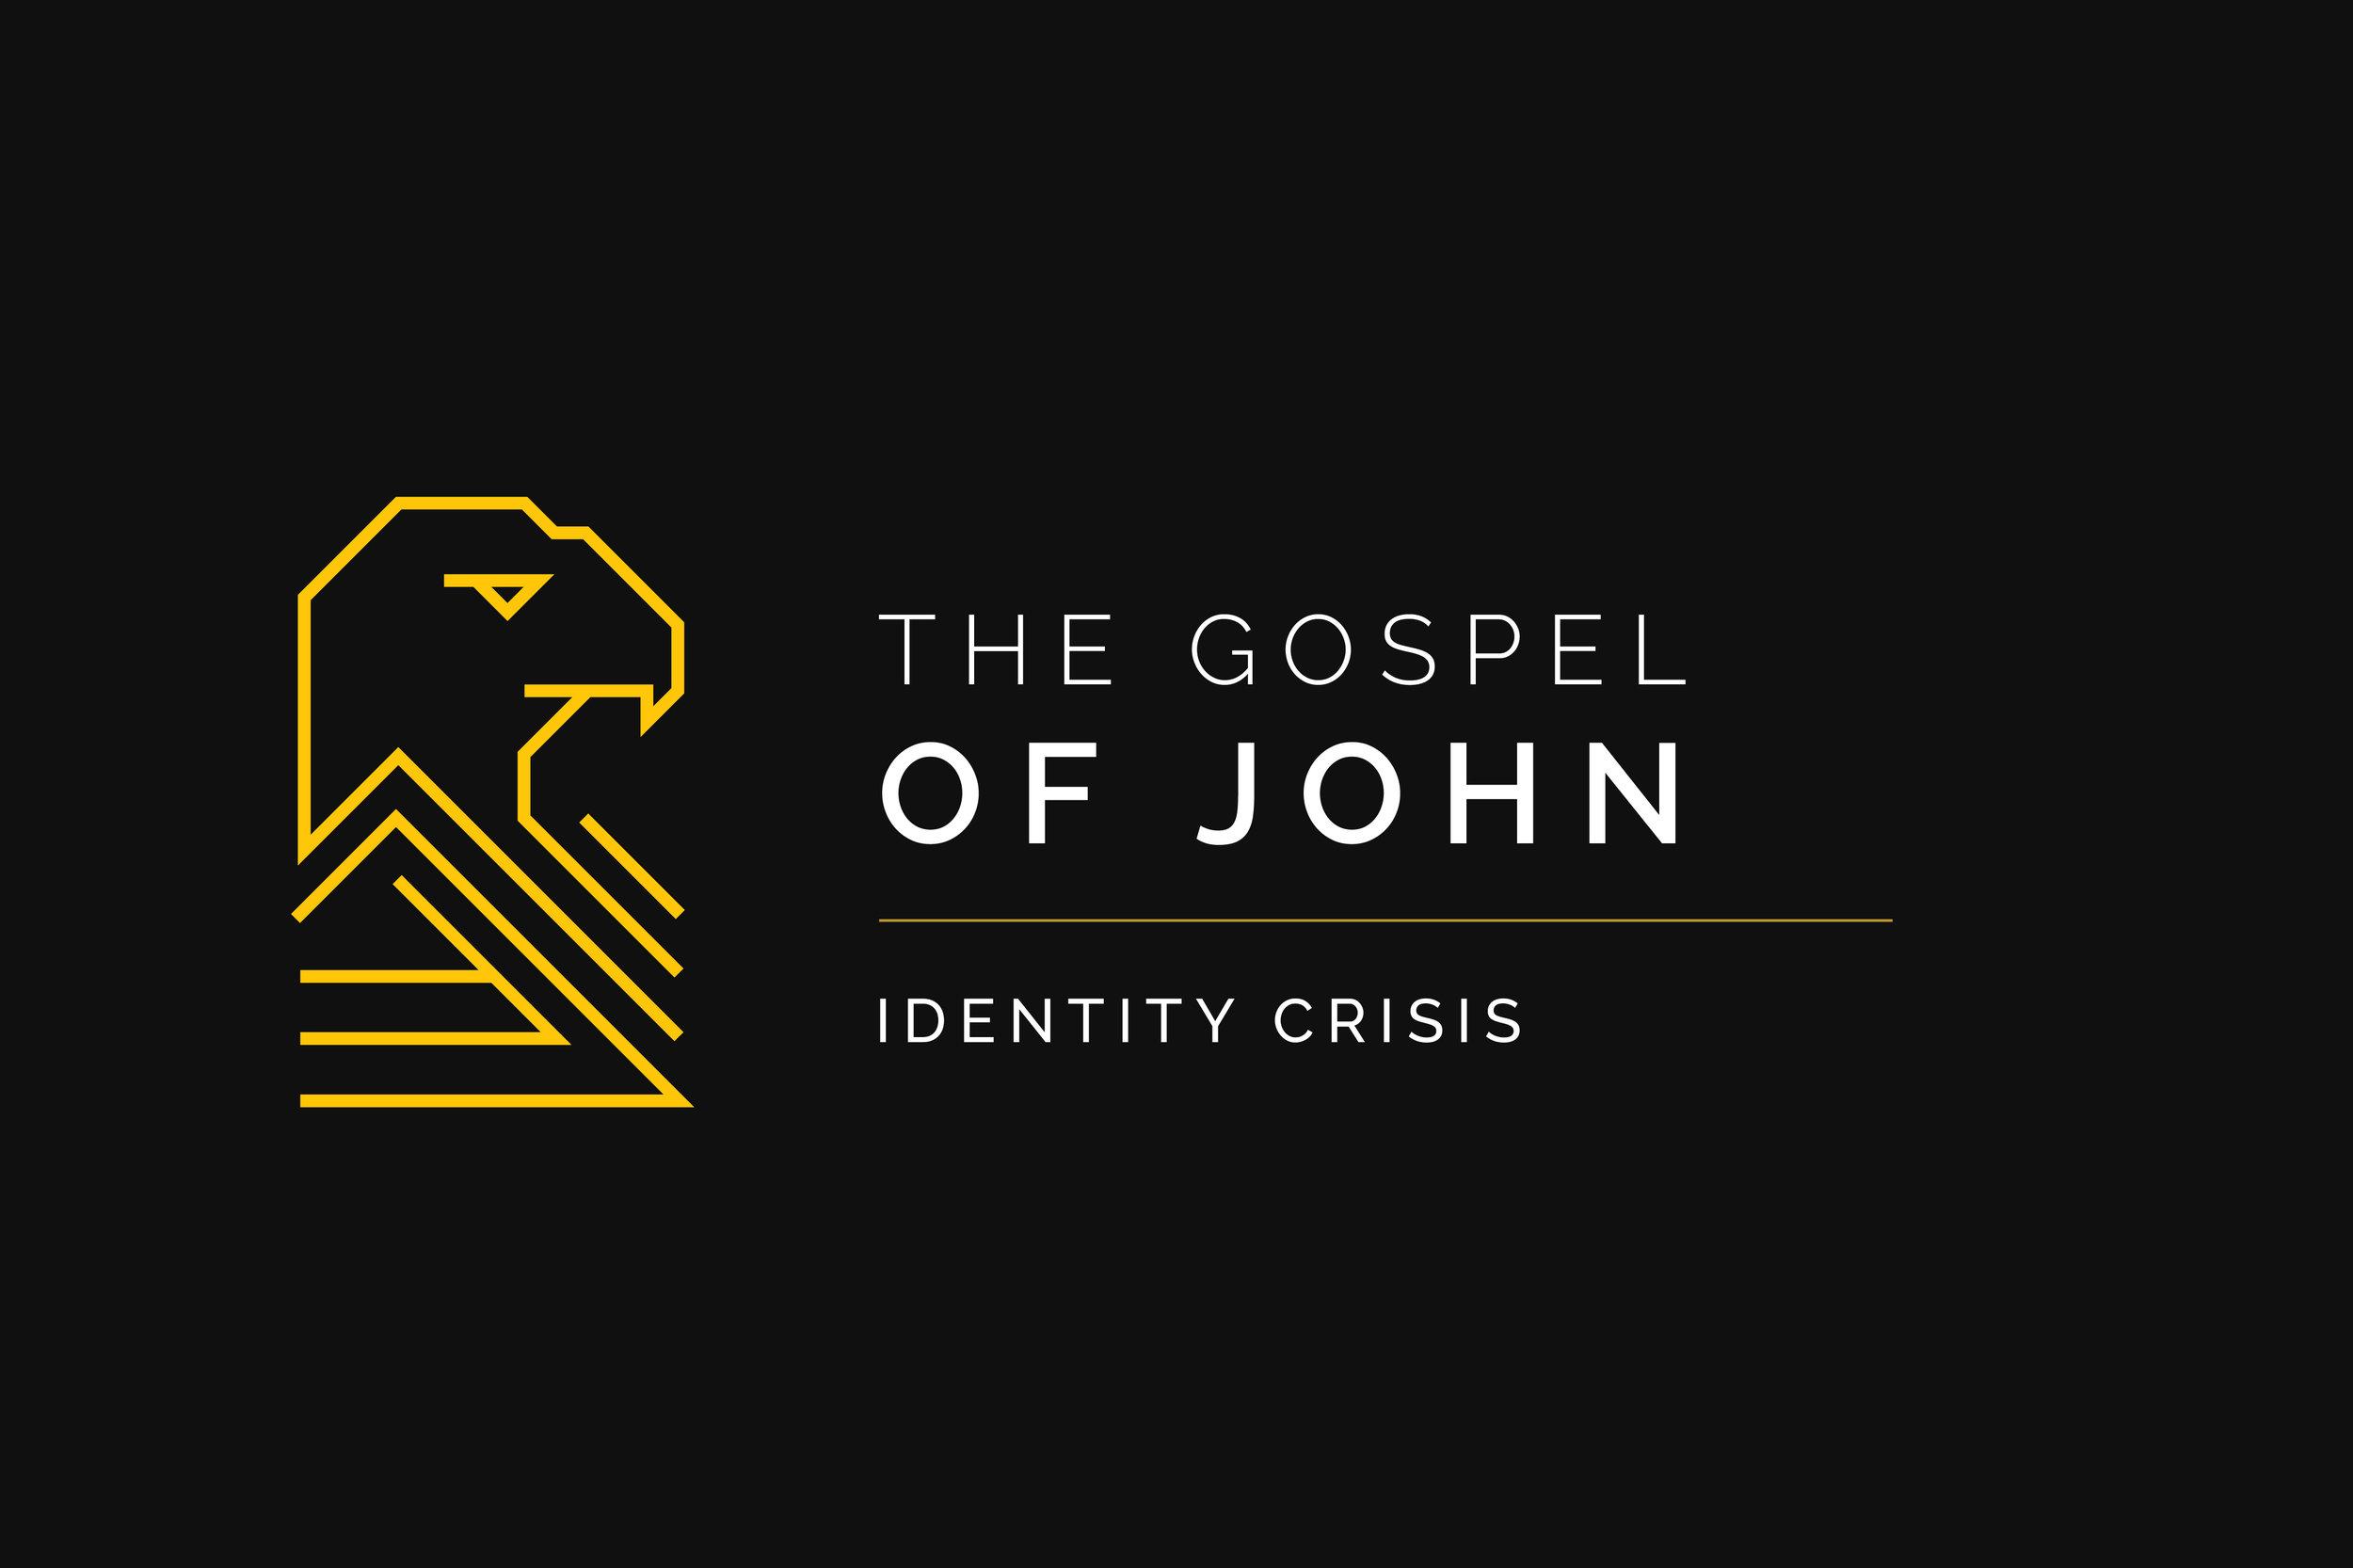 John-Identity-Crisis.jpg